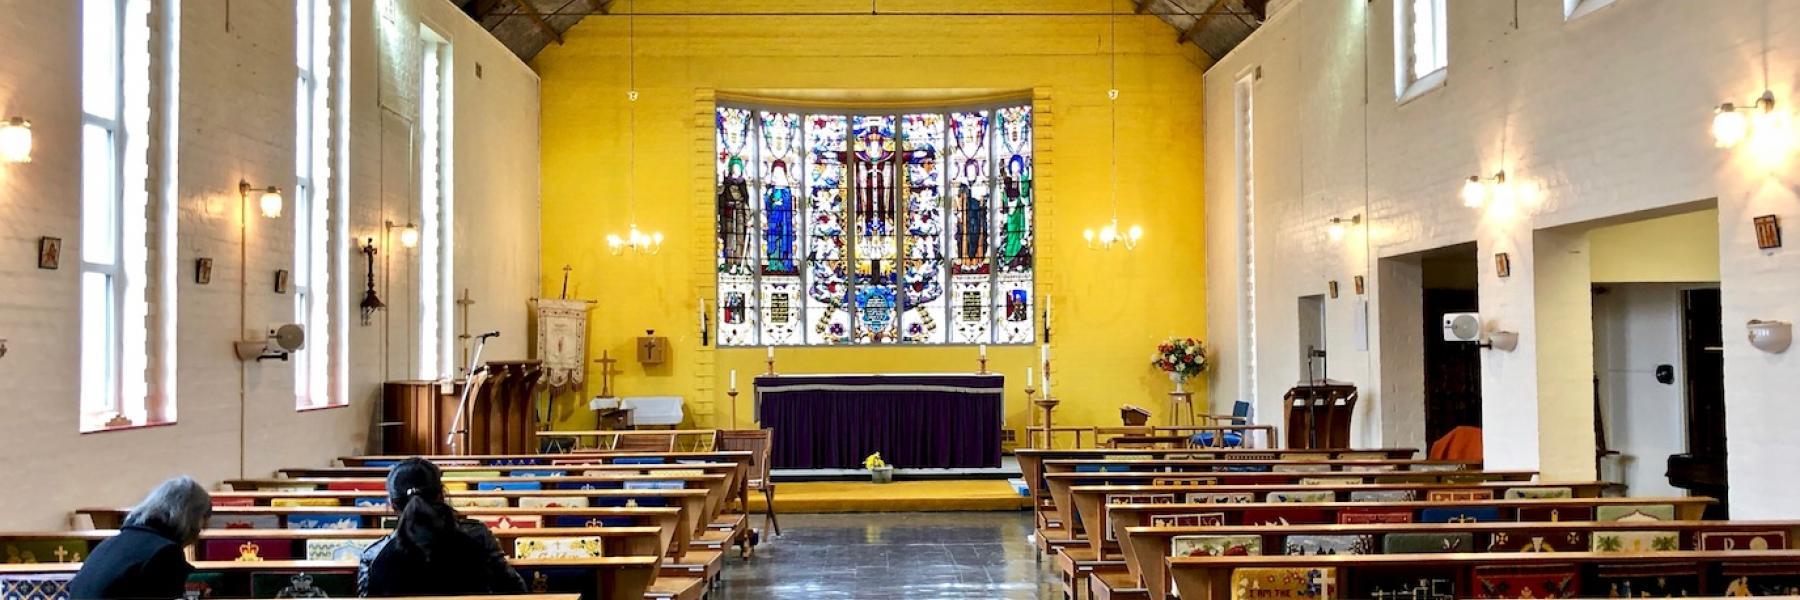 St Alban church Mottingham